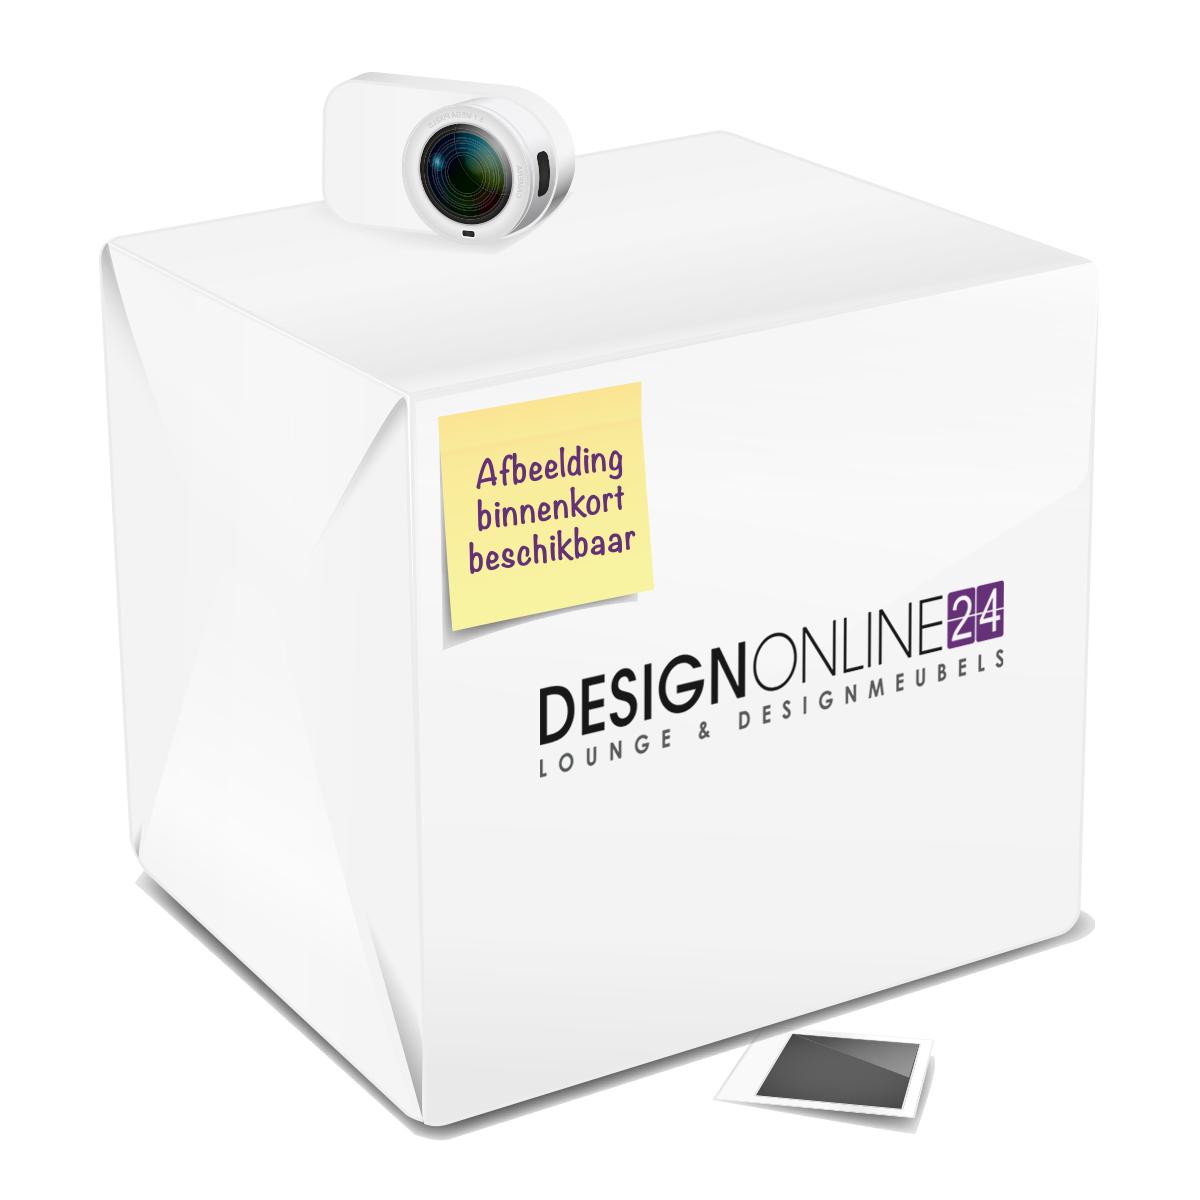 Innovation Innovation Slaapbank Dublexo Armleuningen - Styletto Poten Donker - Mixed Dance Natural 527 - Beige